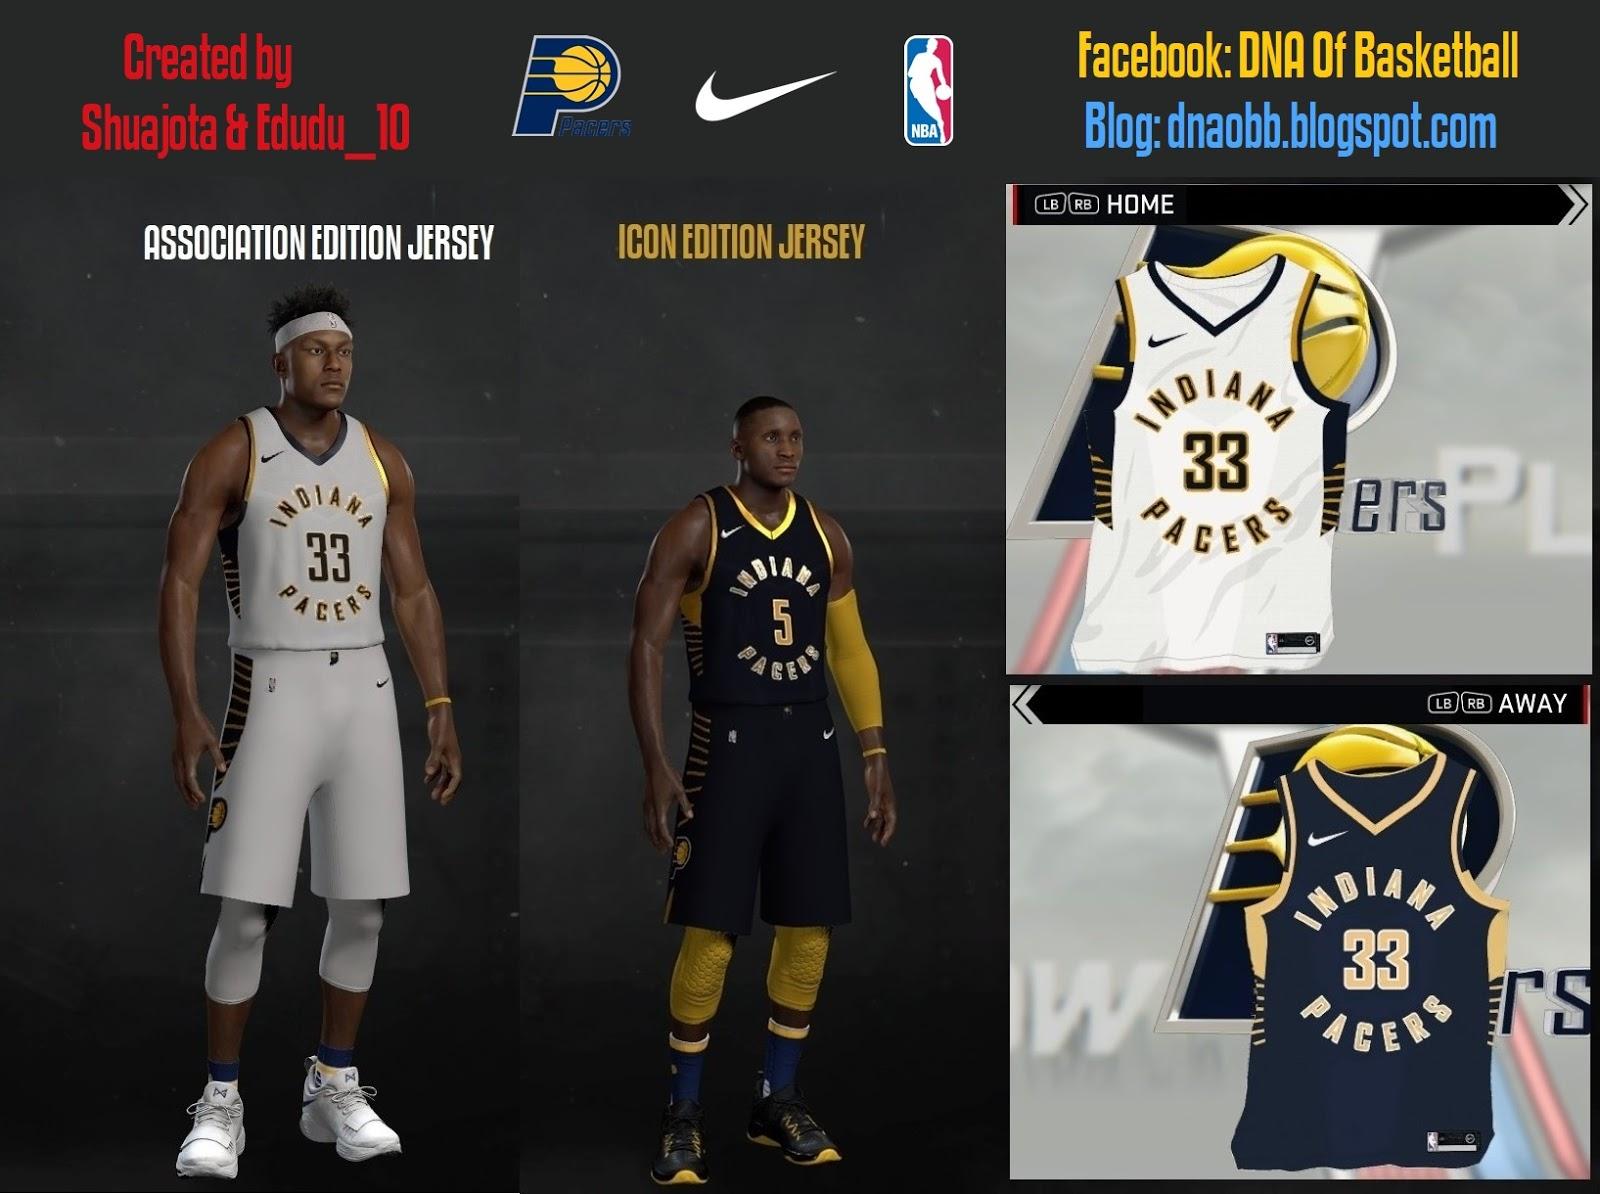 c7ac8d947418 NBA 2K17 Indiana Pacers Jerseys 2017-2018 by Shuajota   Edudu 10. Shuajota  2 years ago NBA 2K17 Jerseys